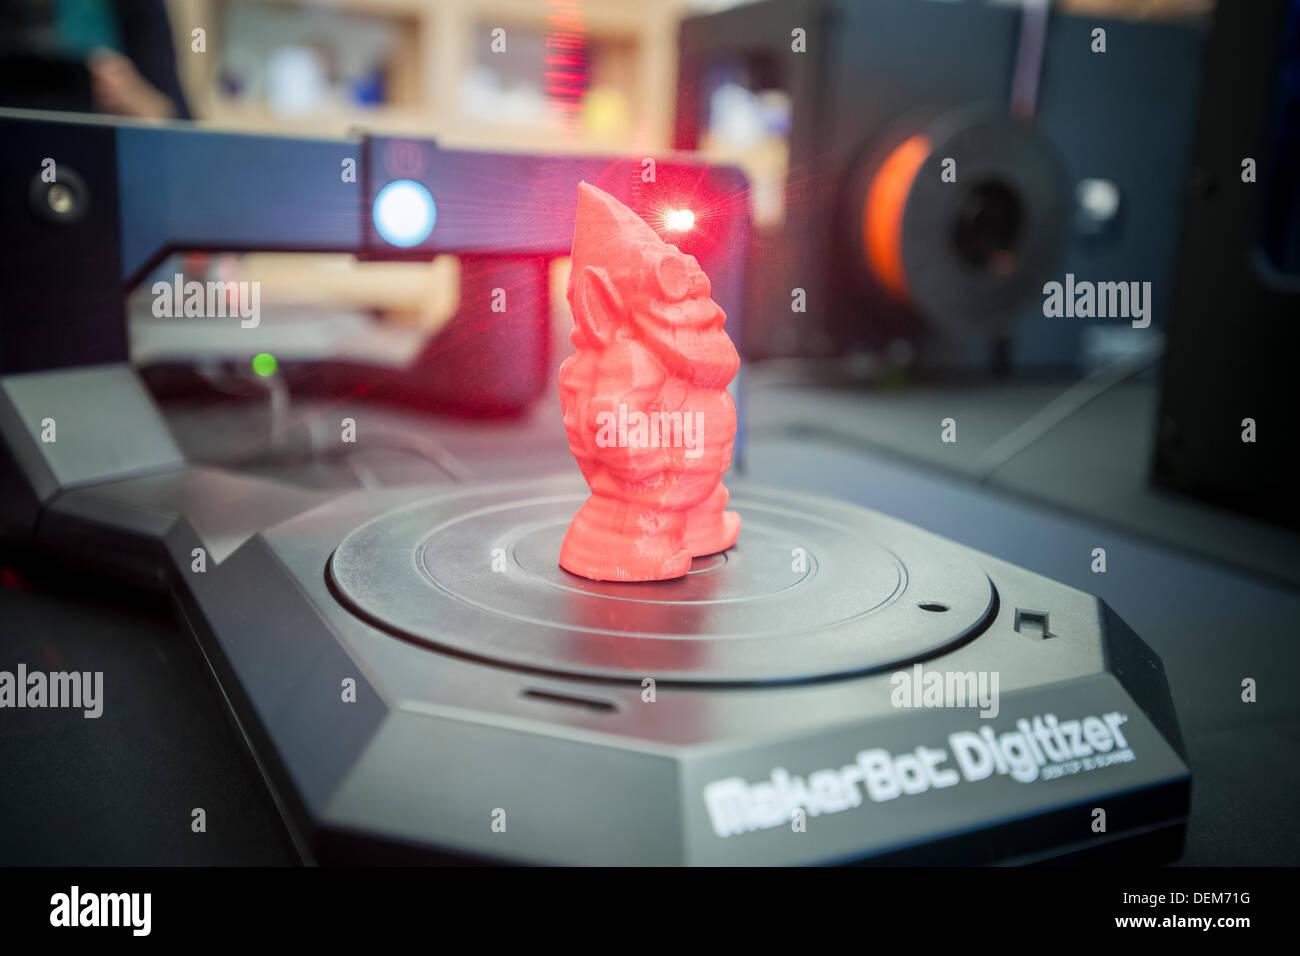 New York, USA. 20. September 2013. MakerBot Industries MakerBot Digitizer Desktop 3D Scanner scannt eine Gnome-Figur Stockbild